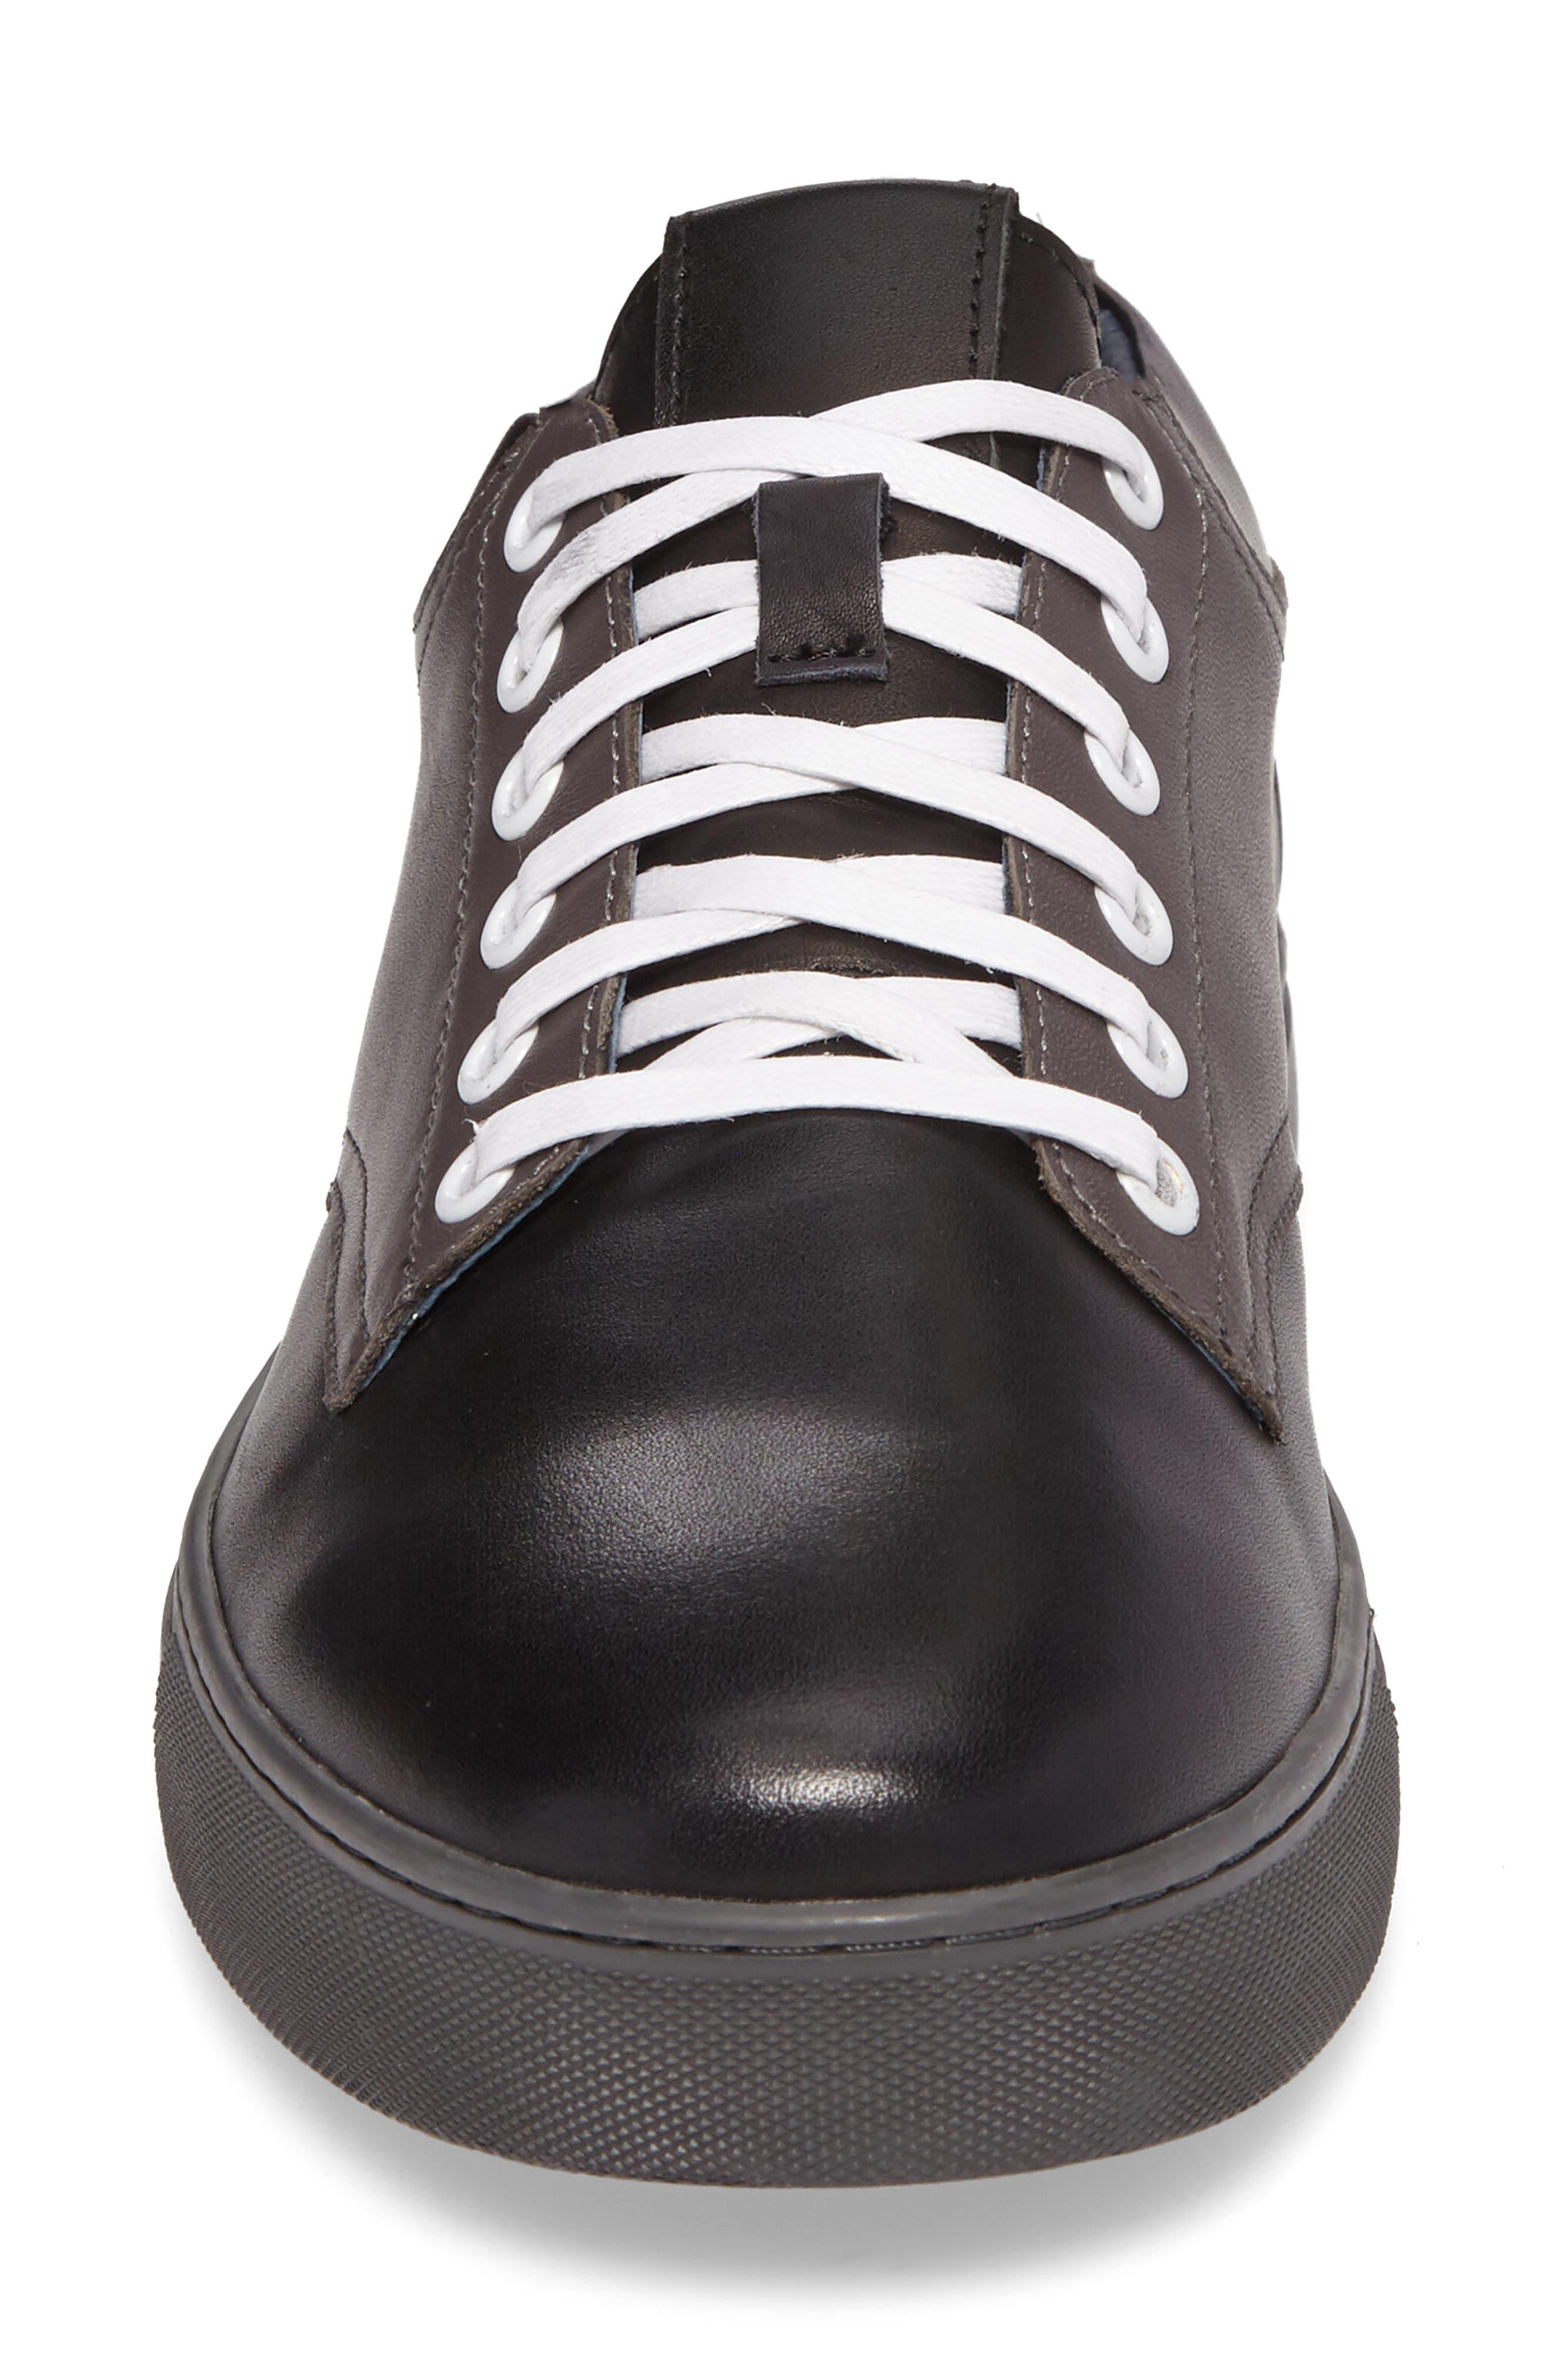 Ralston Sneaker,                             Alternate thumbnail 4, color,                             021